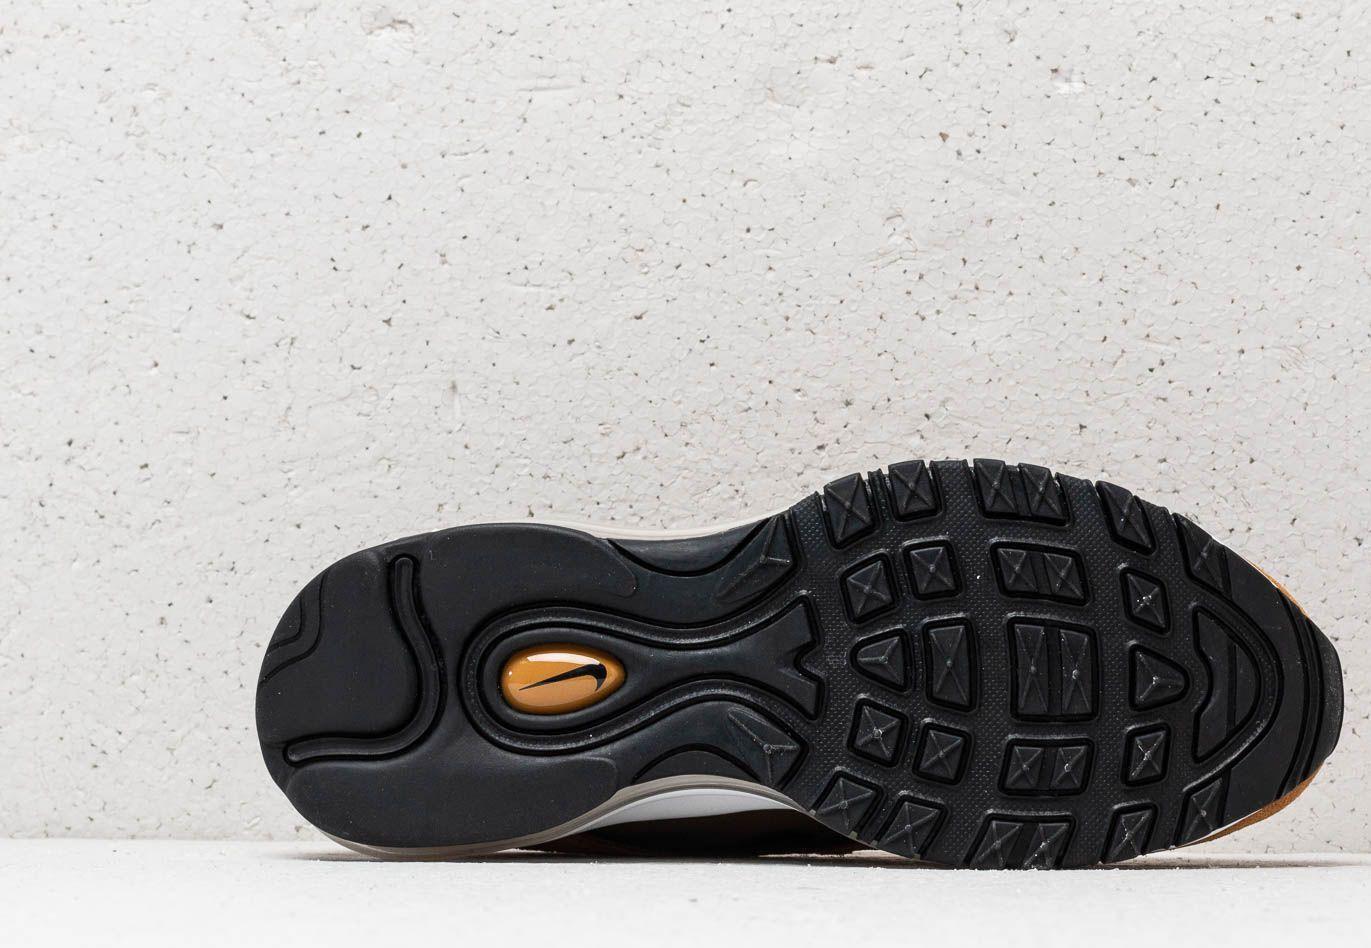 Nike WMNS Air Max 97 SE Muted Bronze Black White